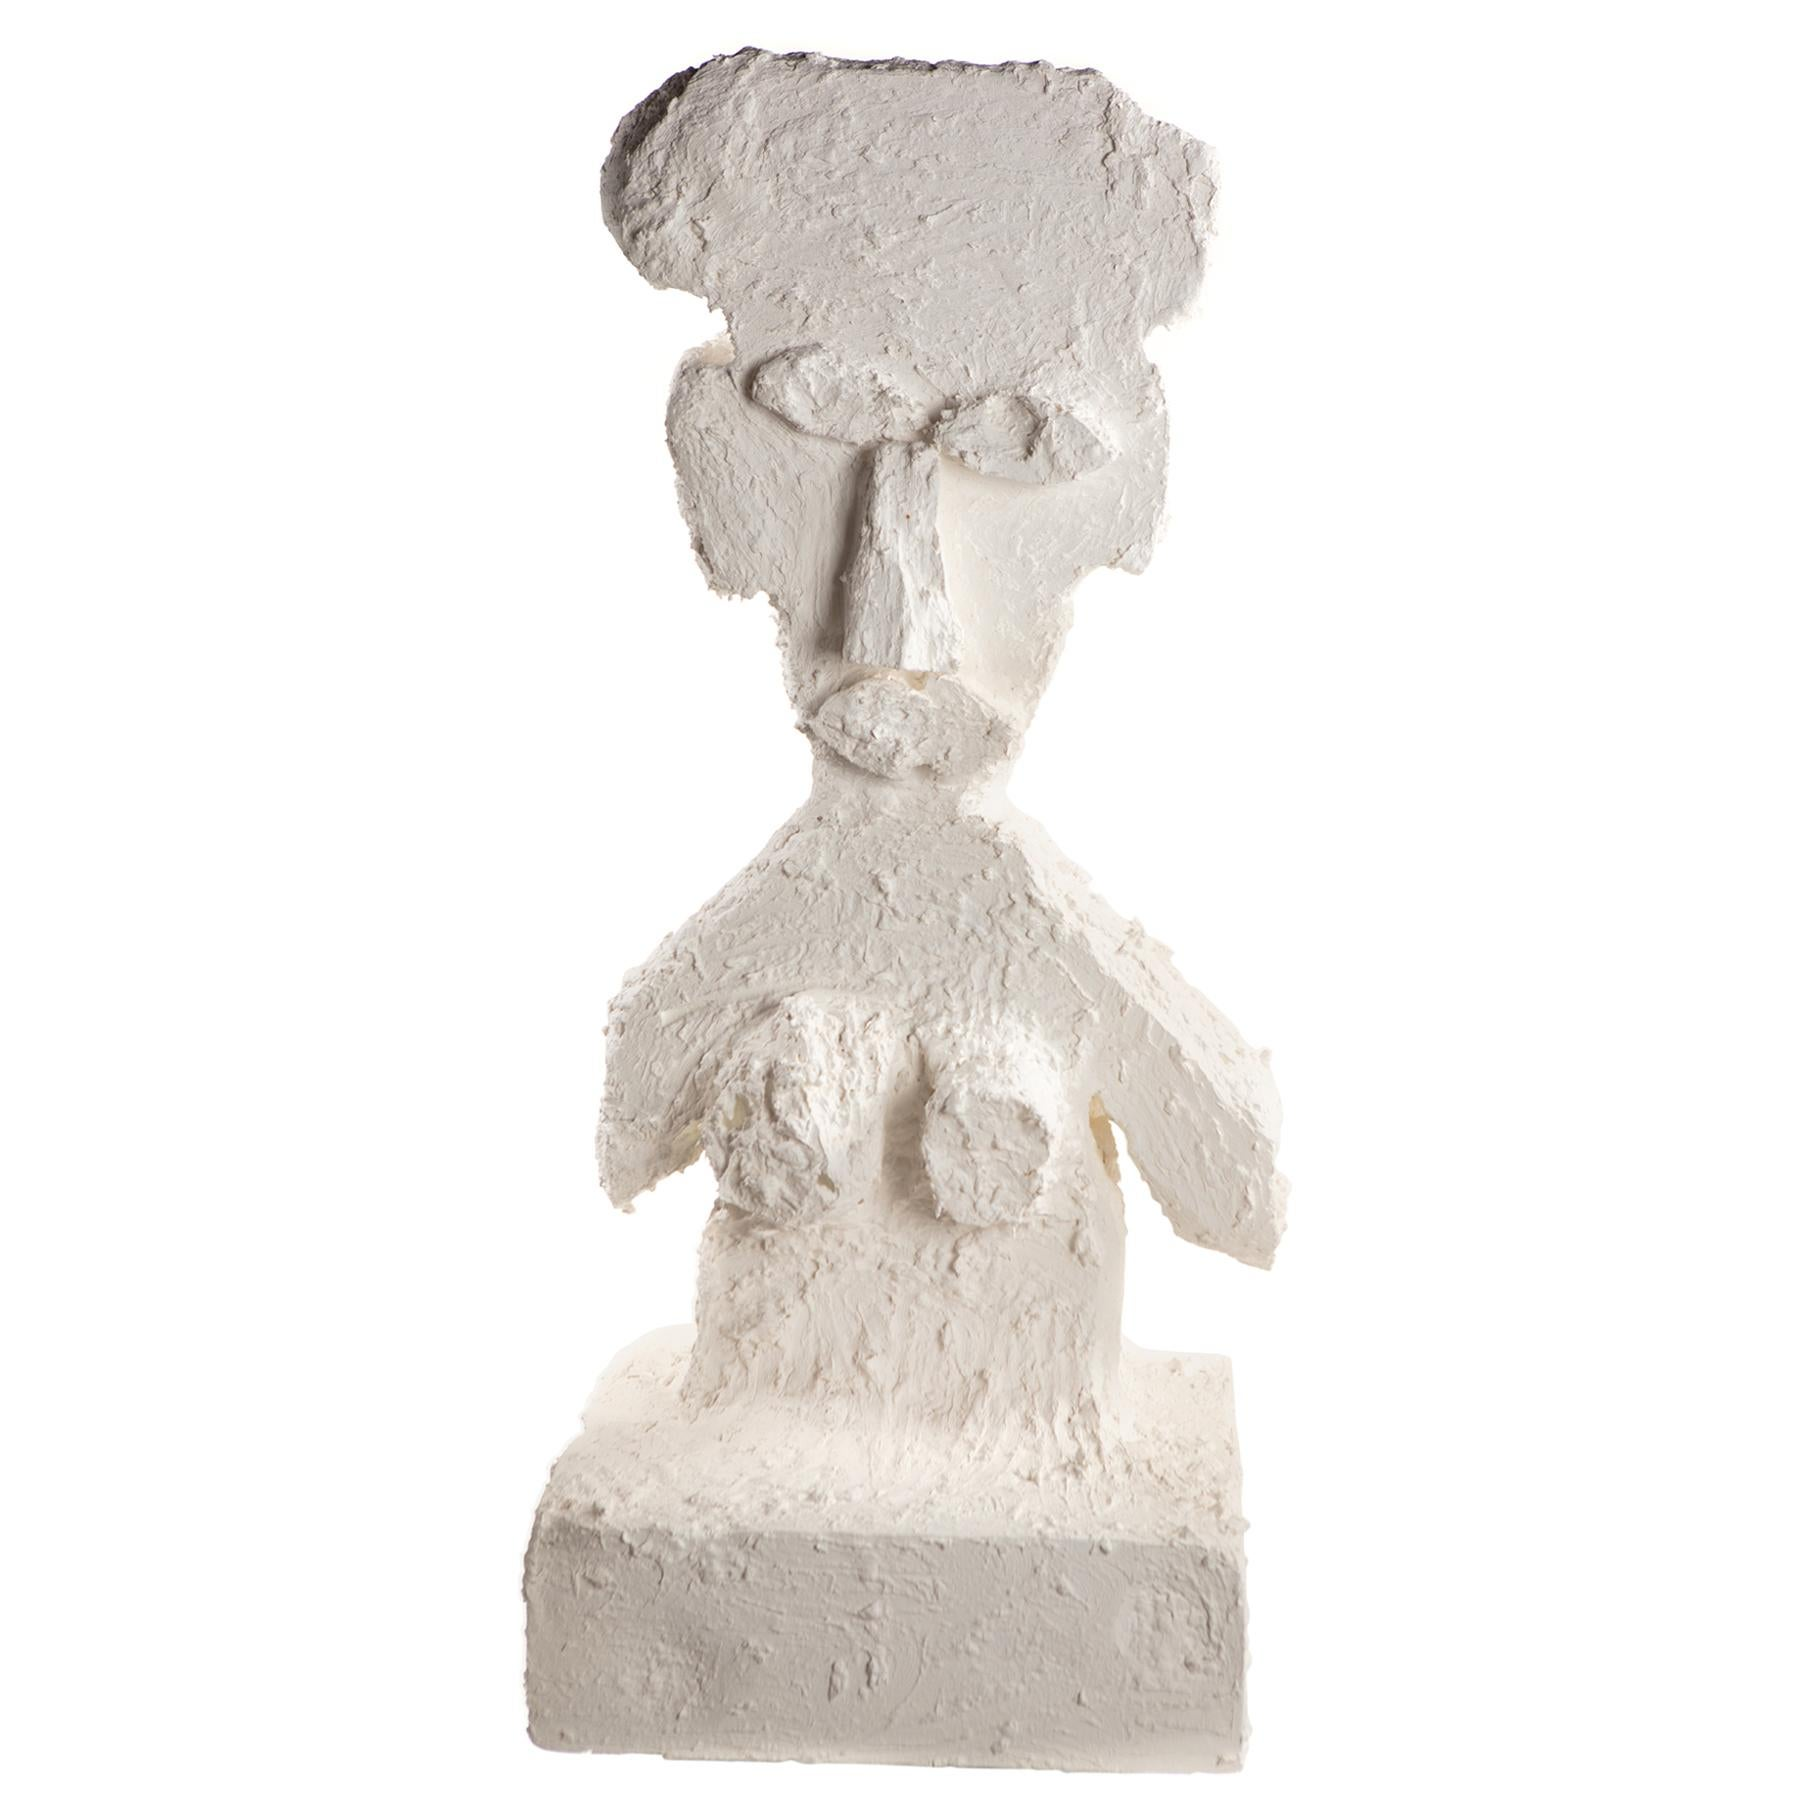 White Plaster Sculptural Figure, 21st Century by Mattia Biagi